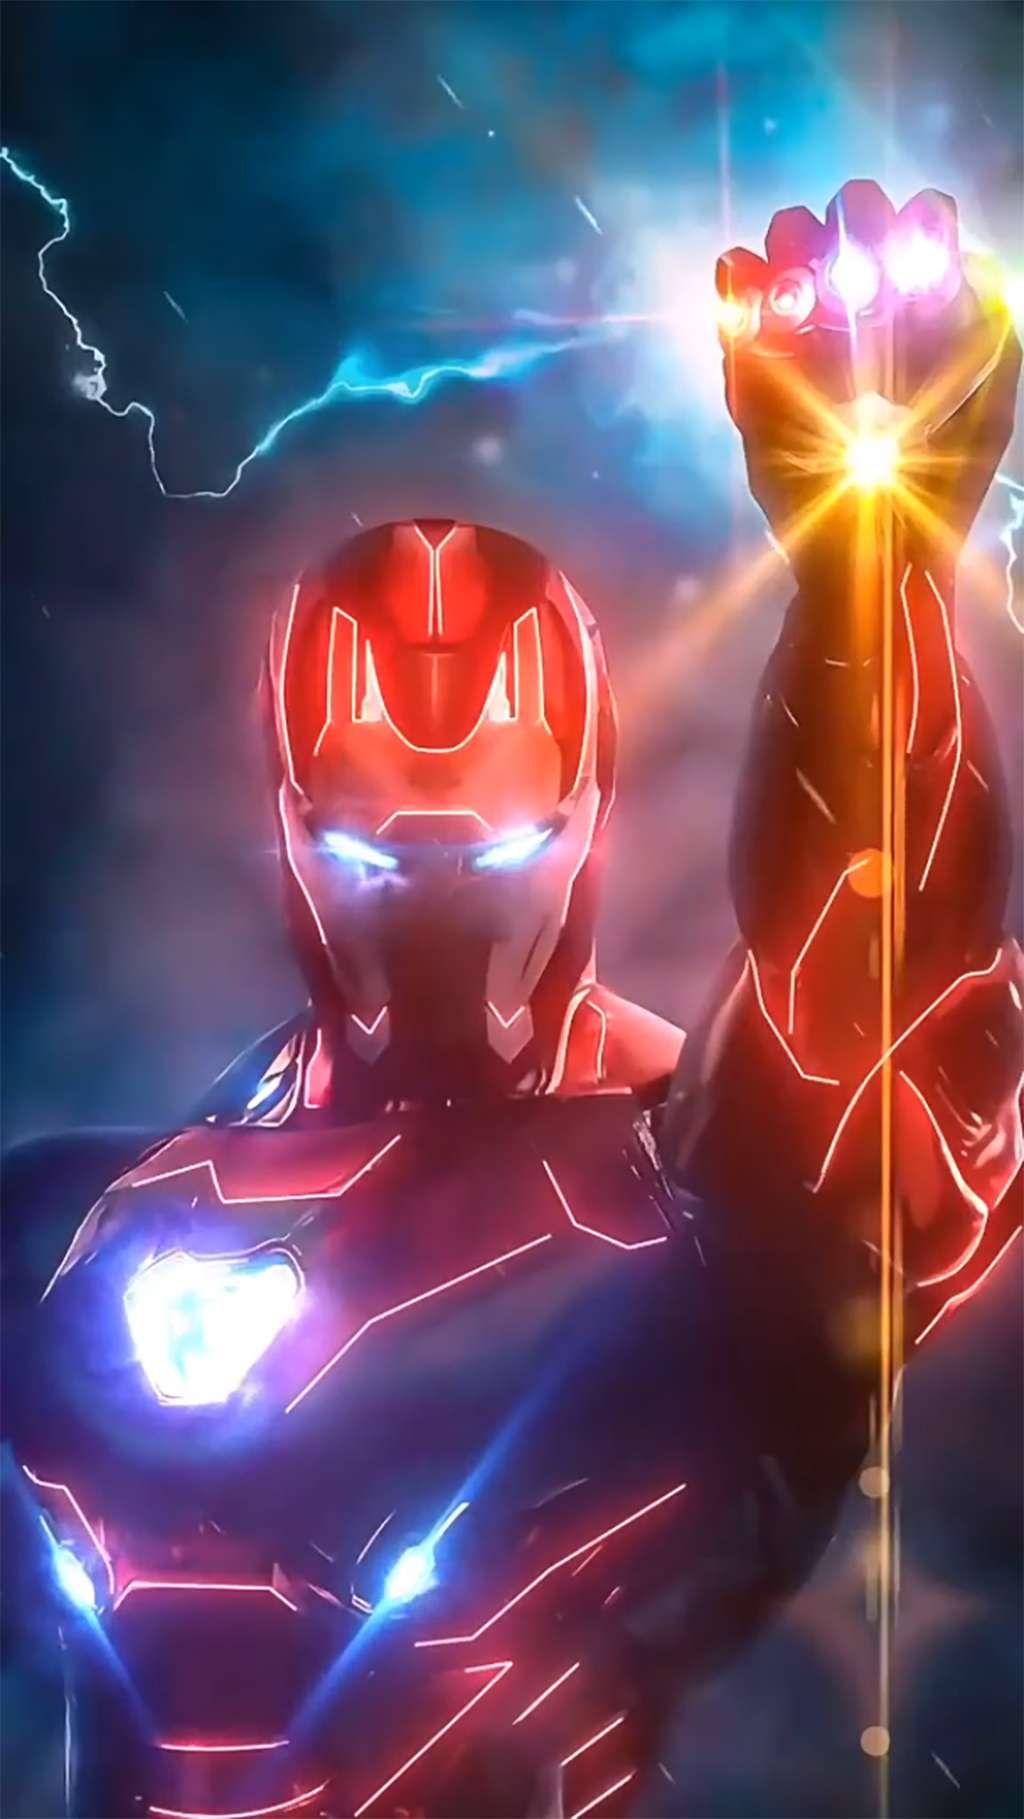 Iron Man Glow Animation | Animated GIFs | 100% Free Media